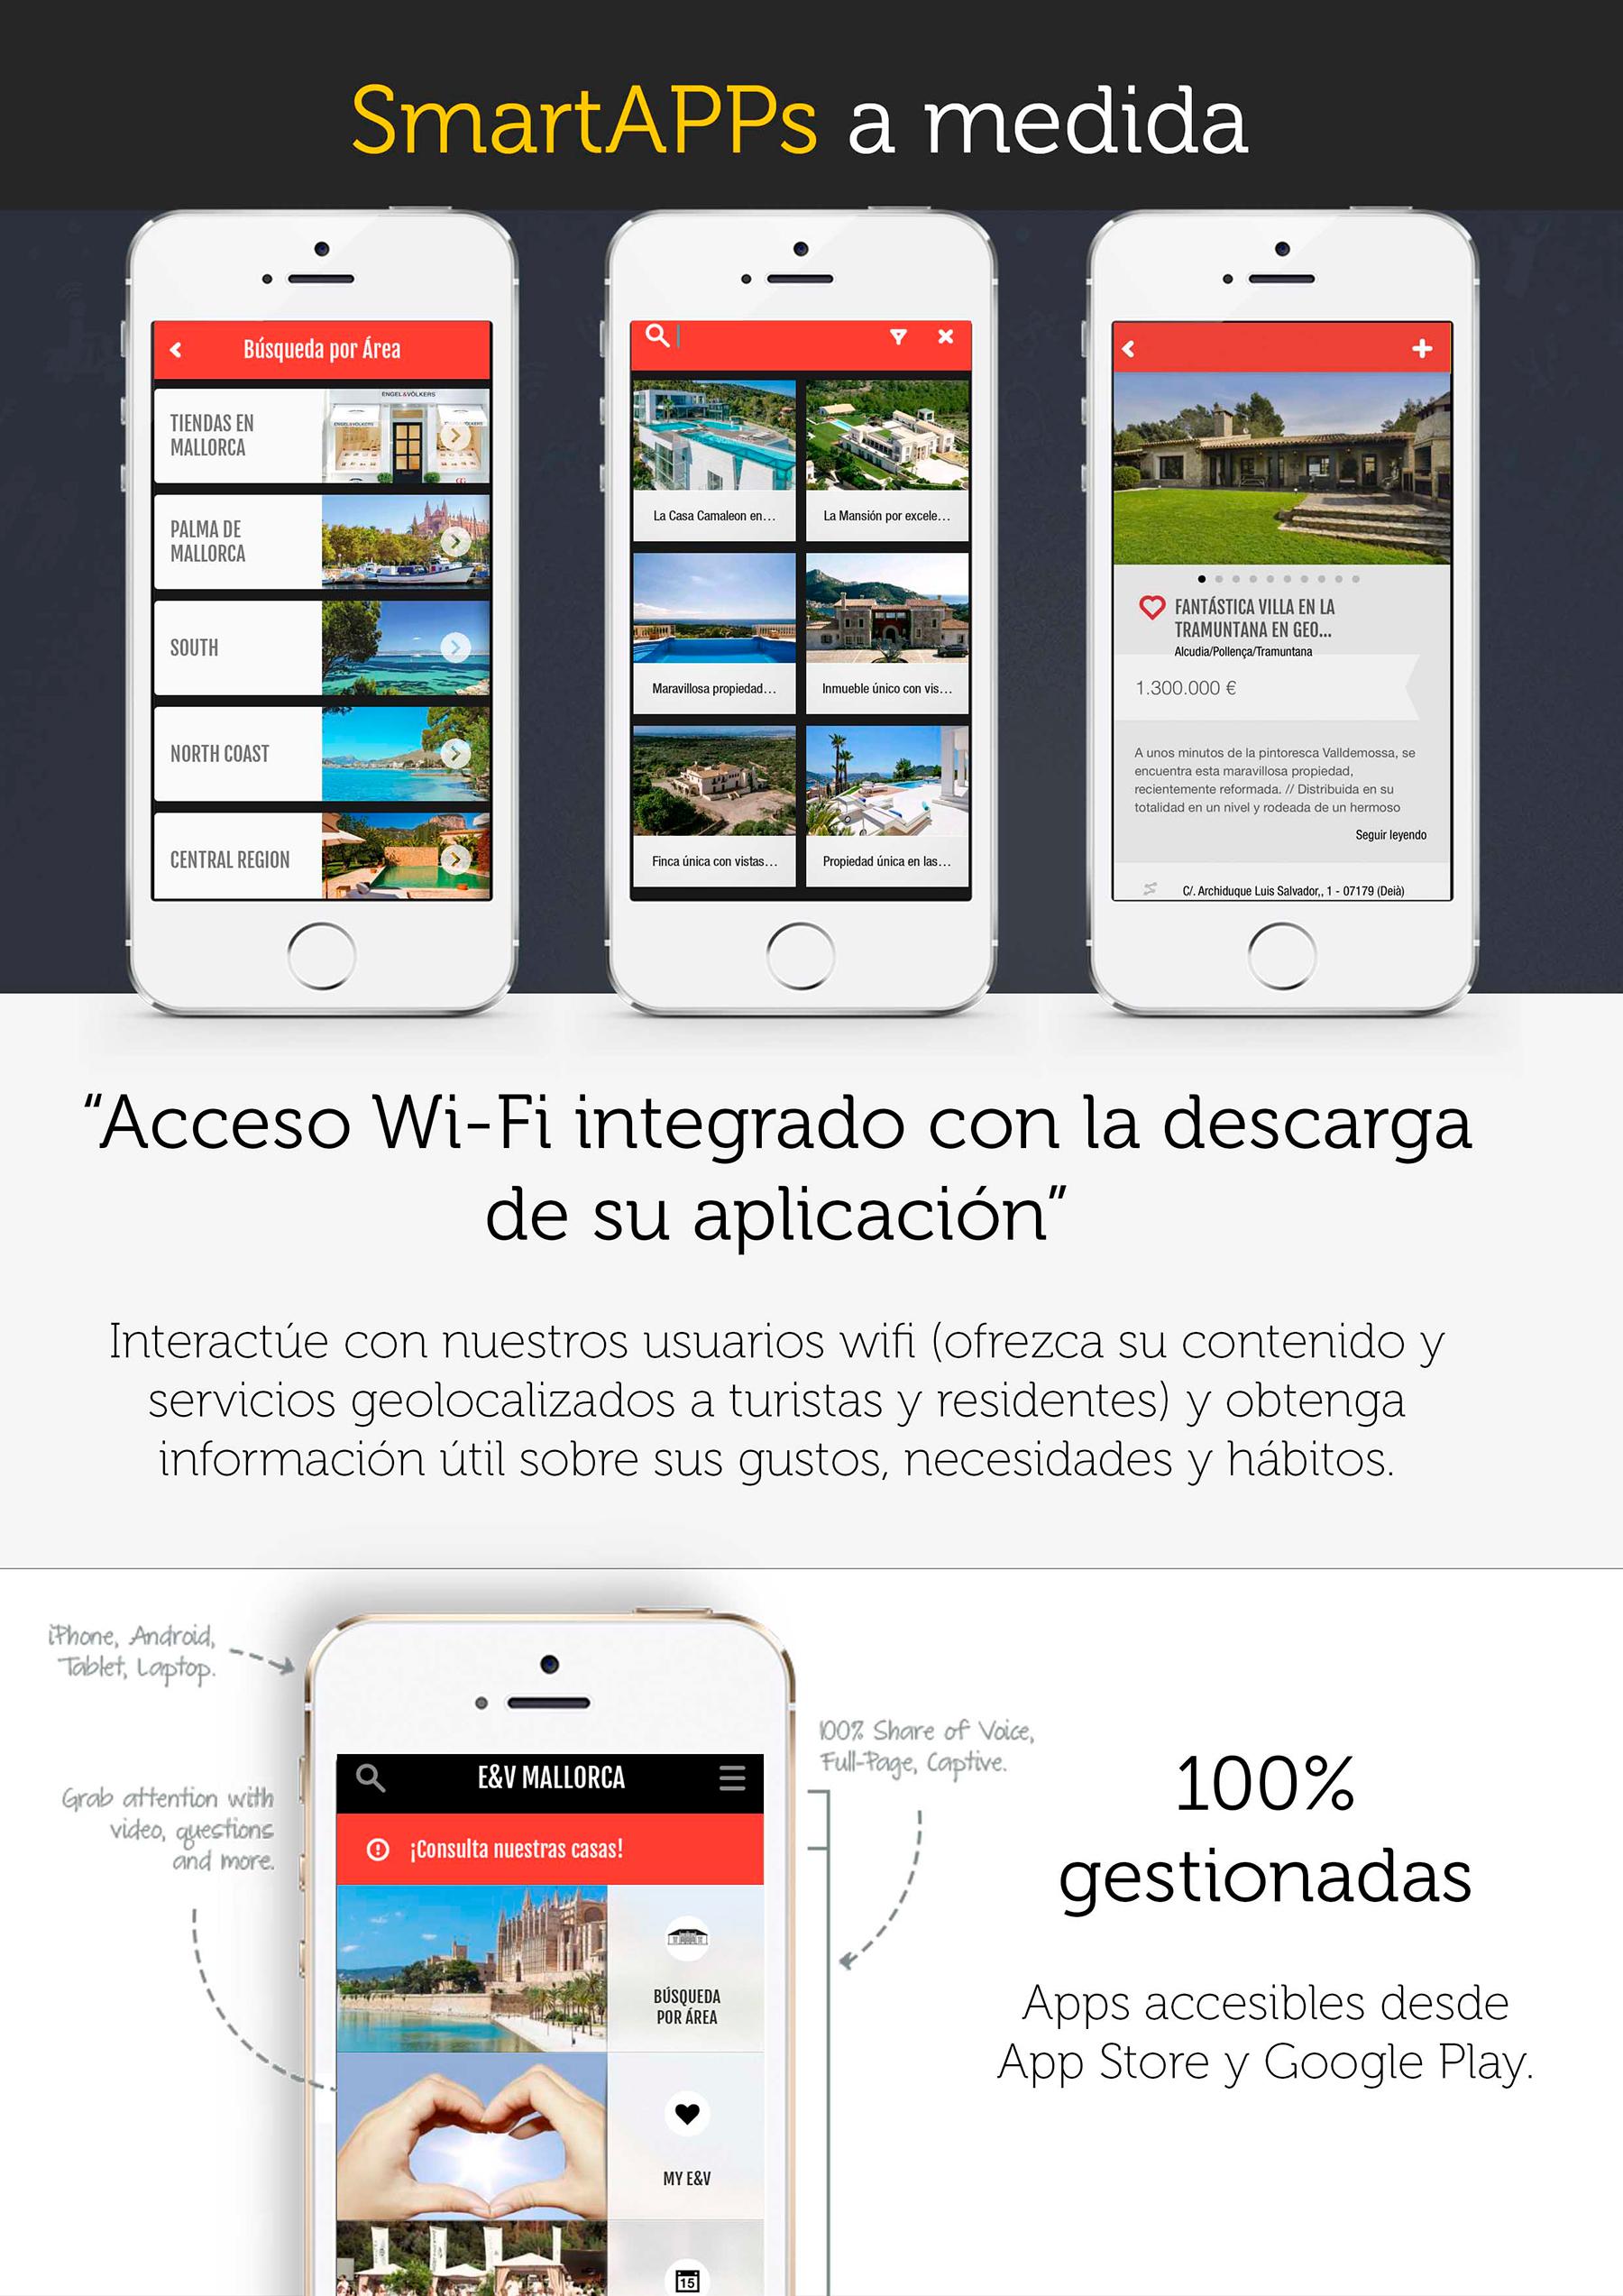 engel-smartapp